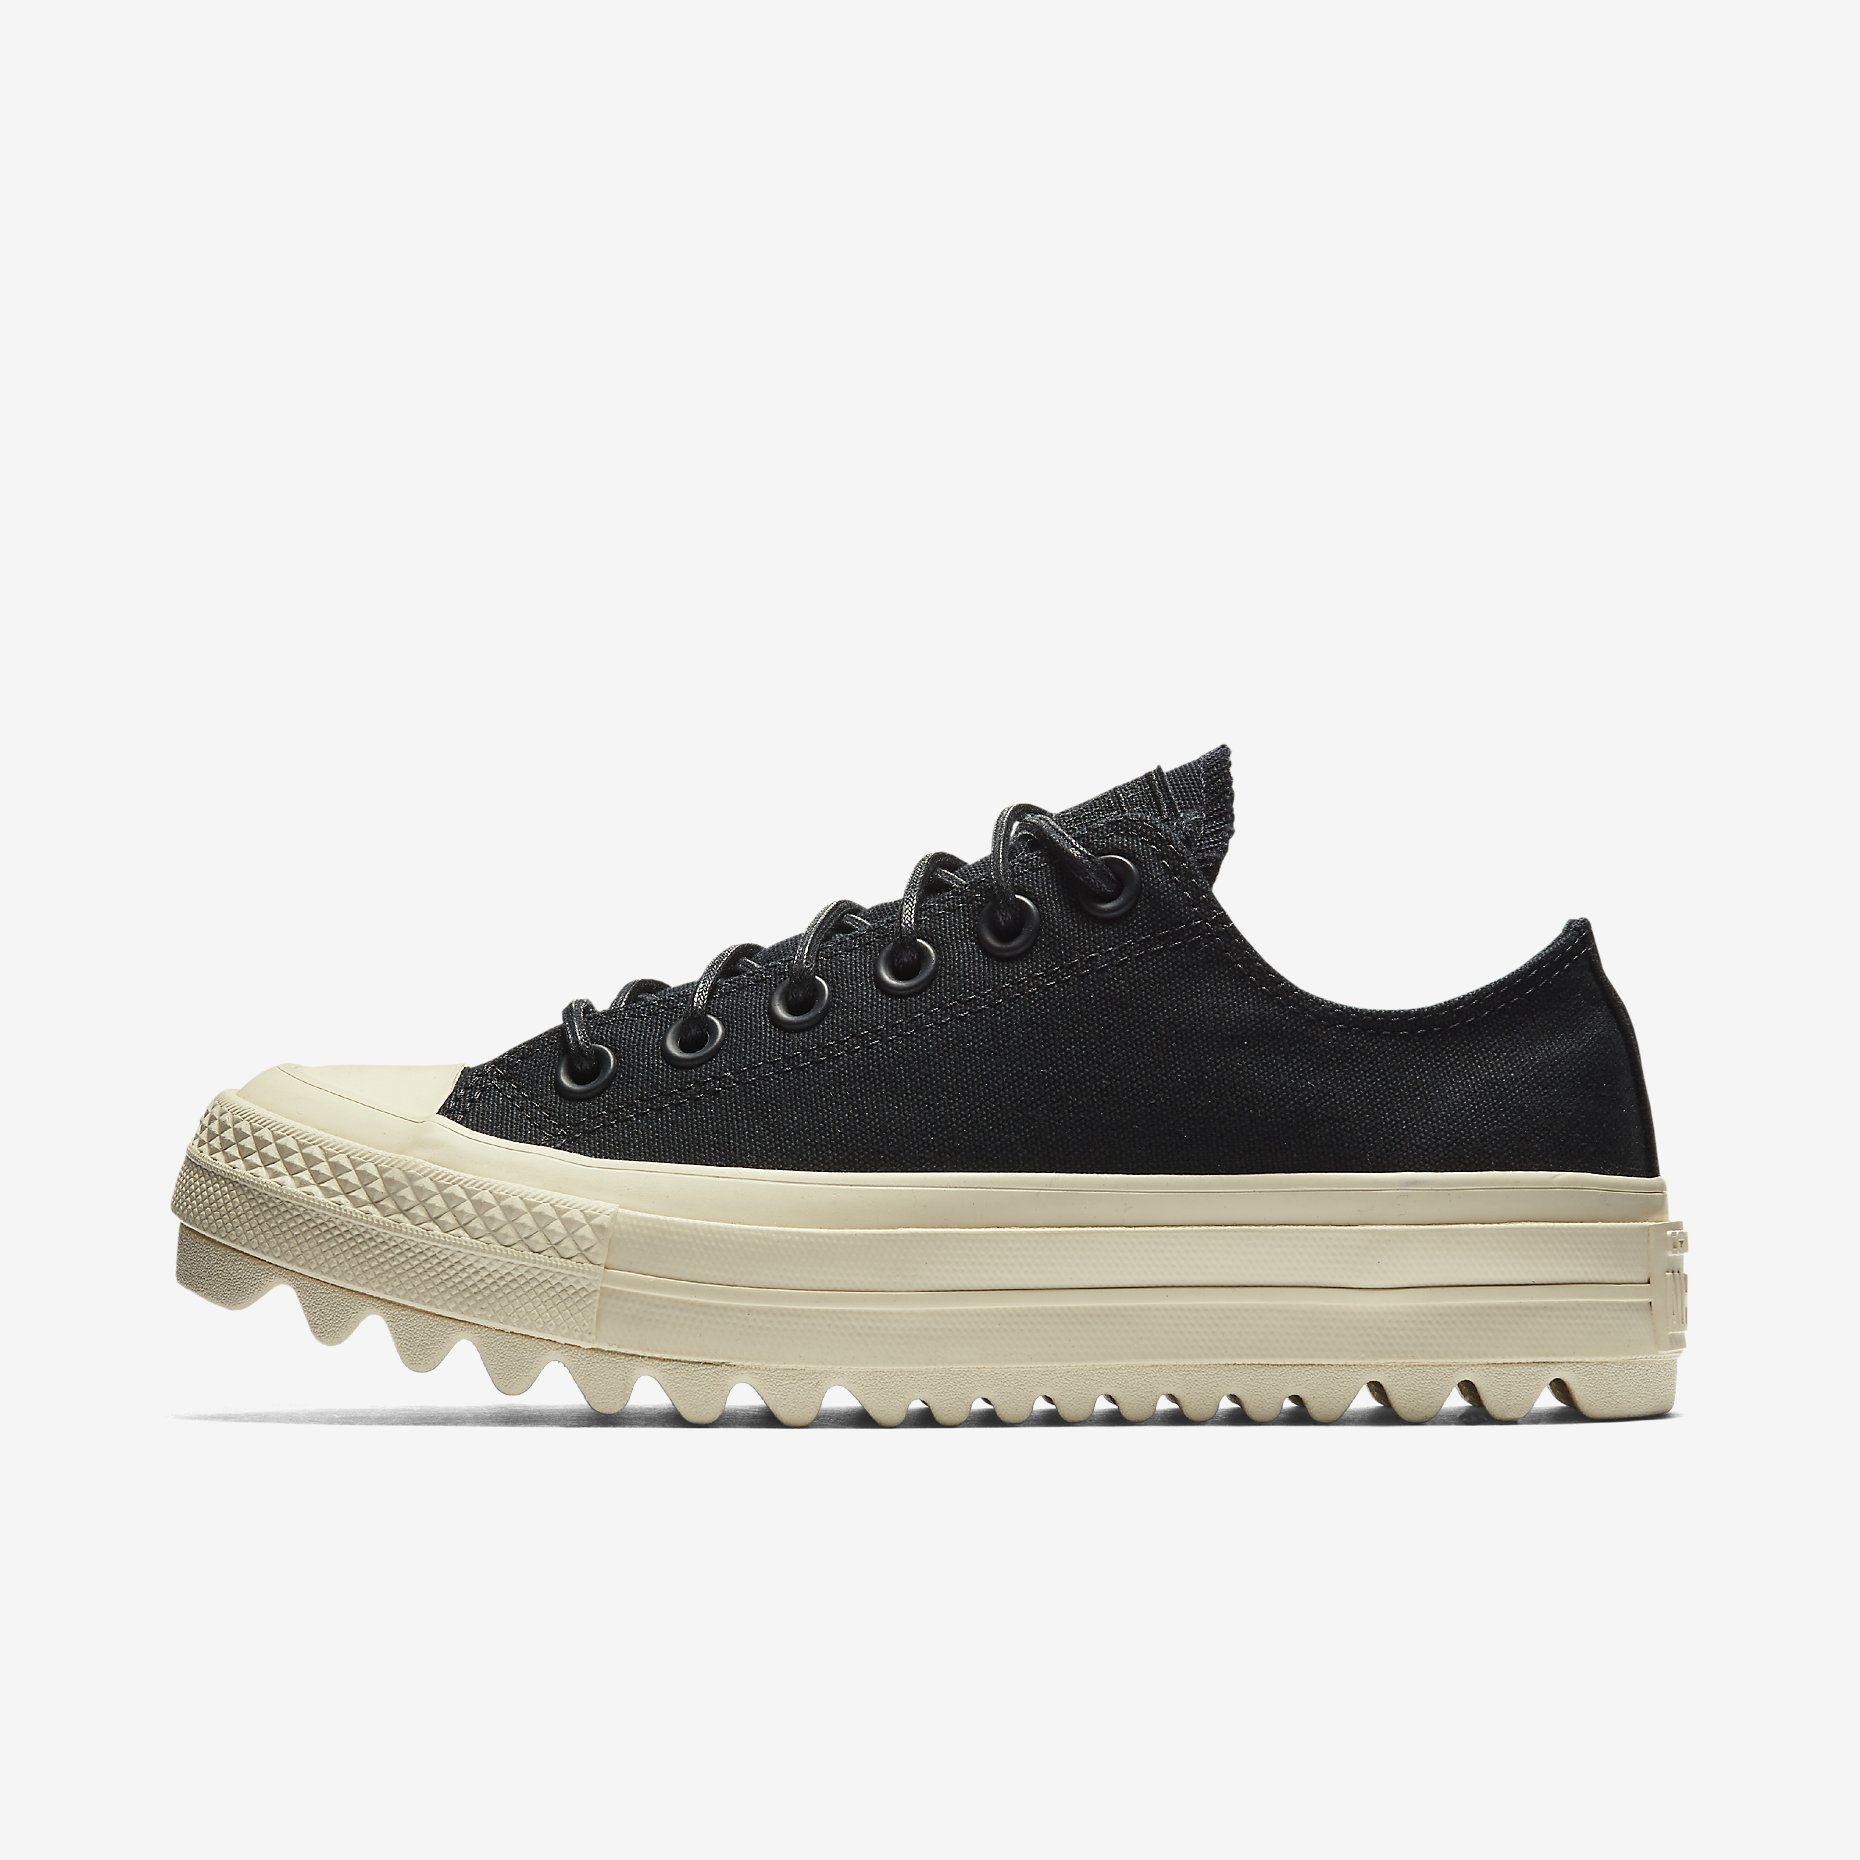 71246c1fa62b Converse Chuck Taylor All Star Lift Ripple Canvas Low Top Women s Shoe.  Nike.com